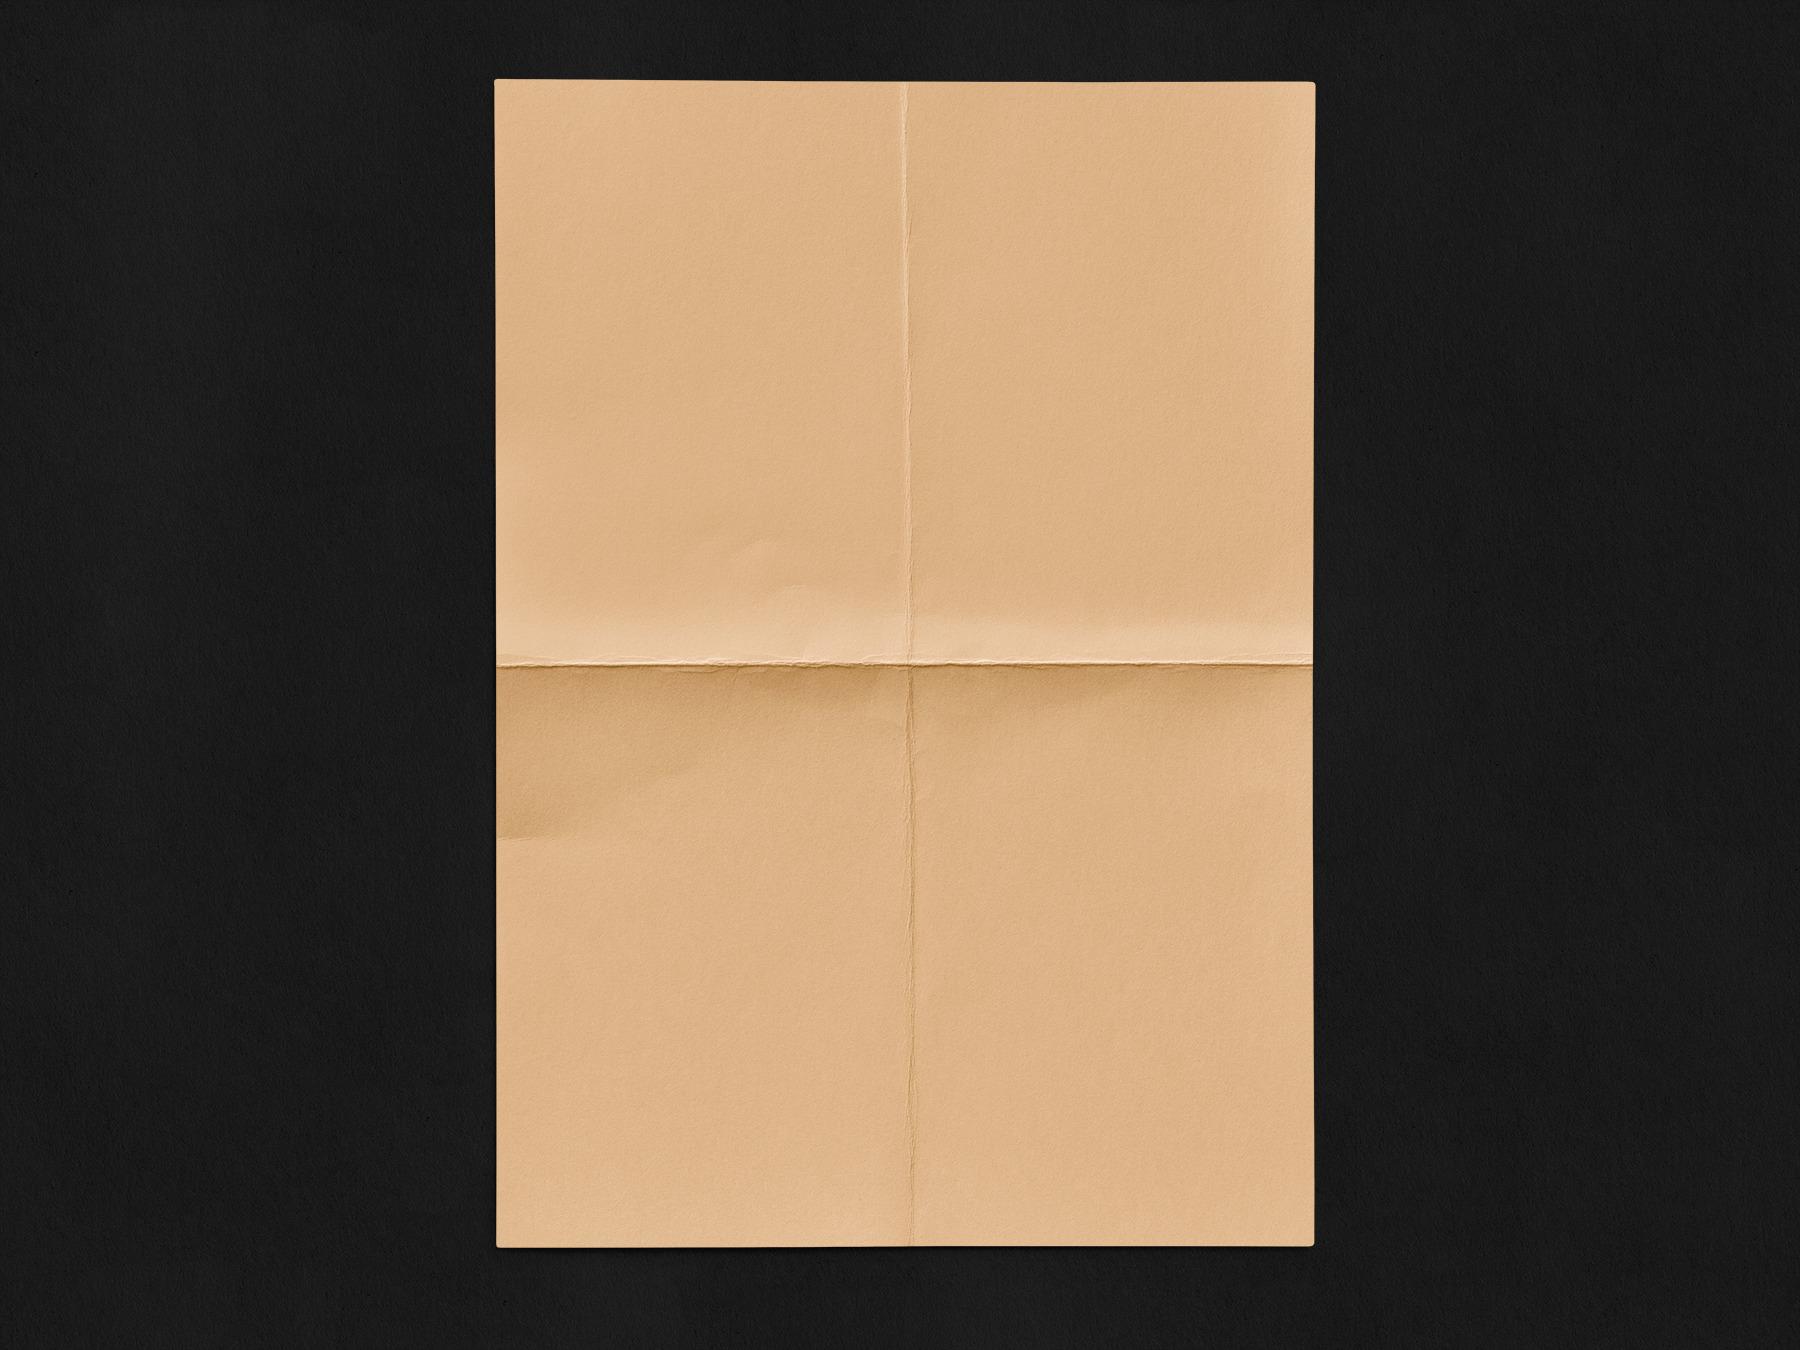 Free Crumpled and wrinkled Paper Mockup Set